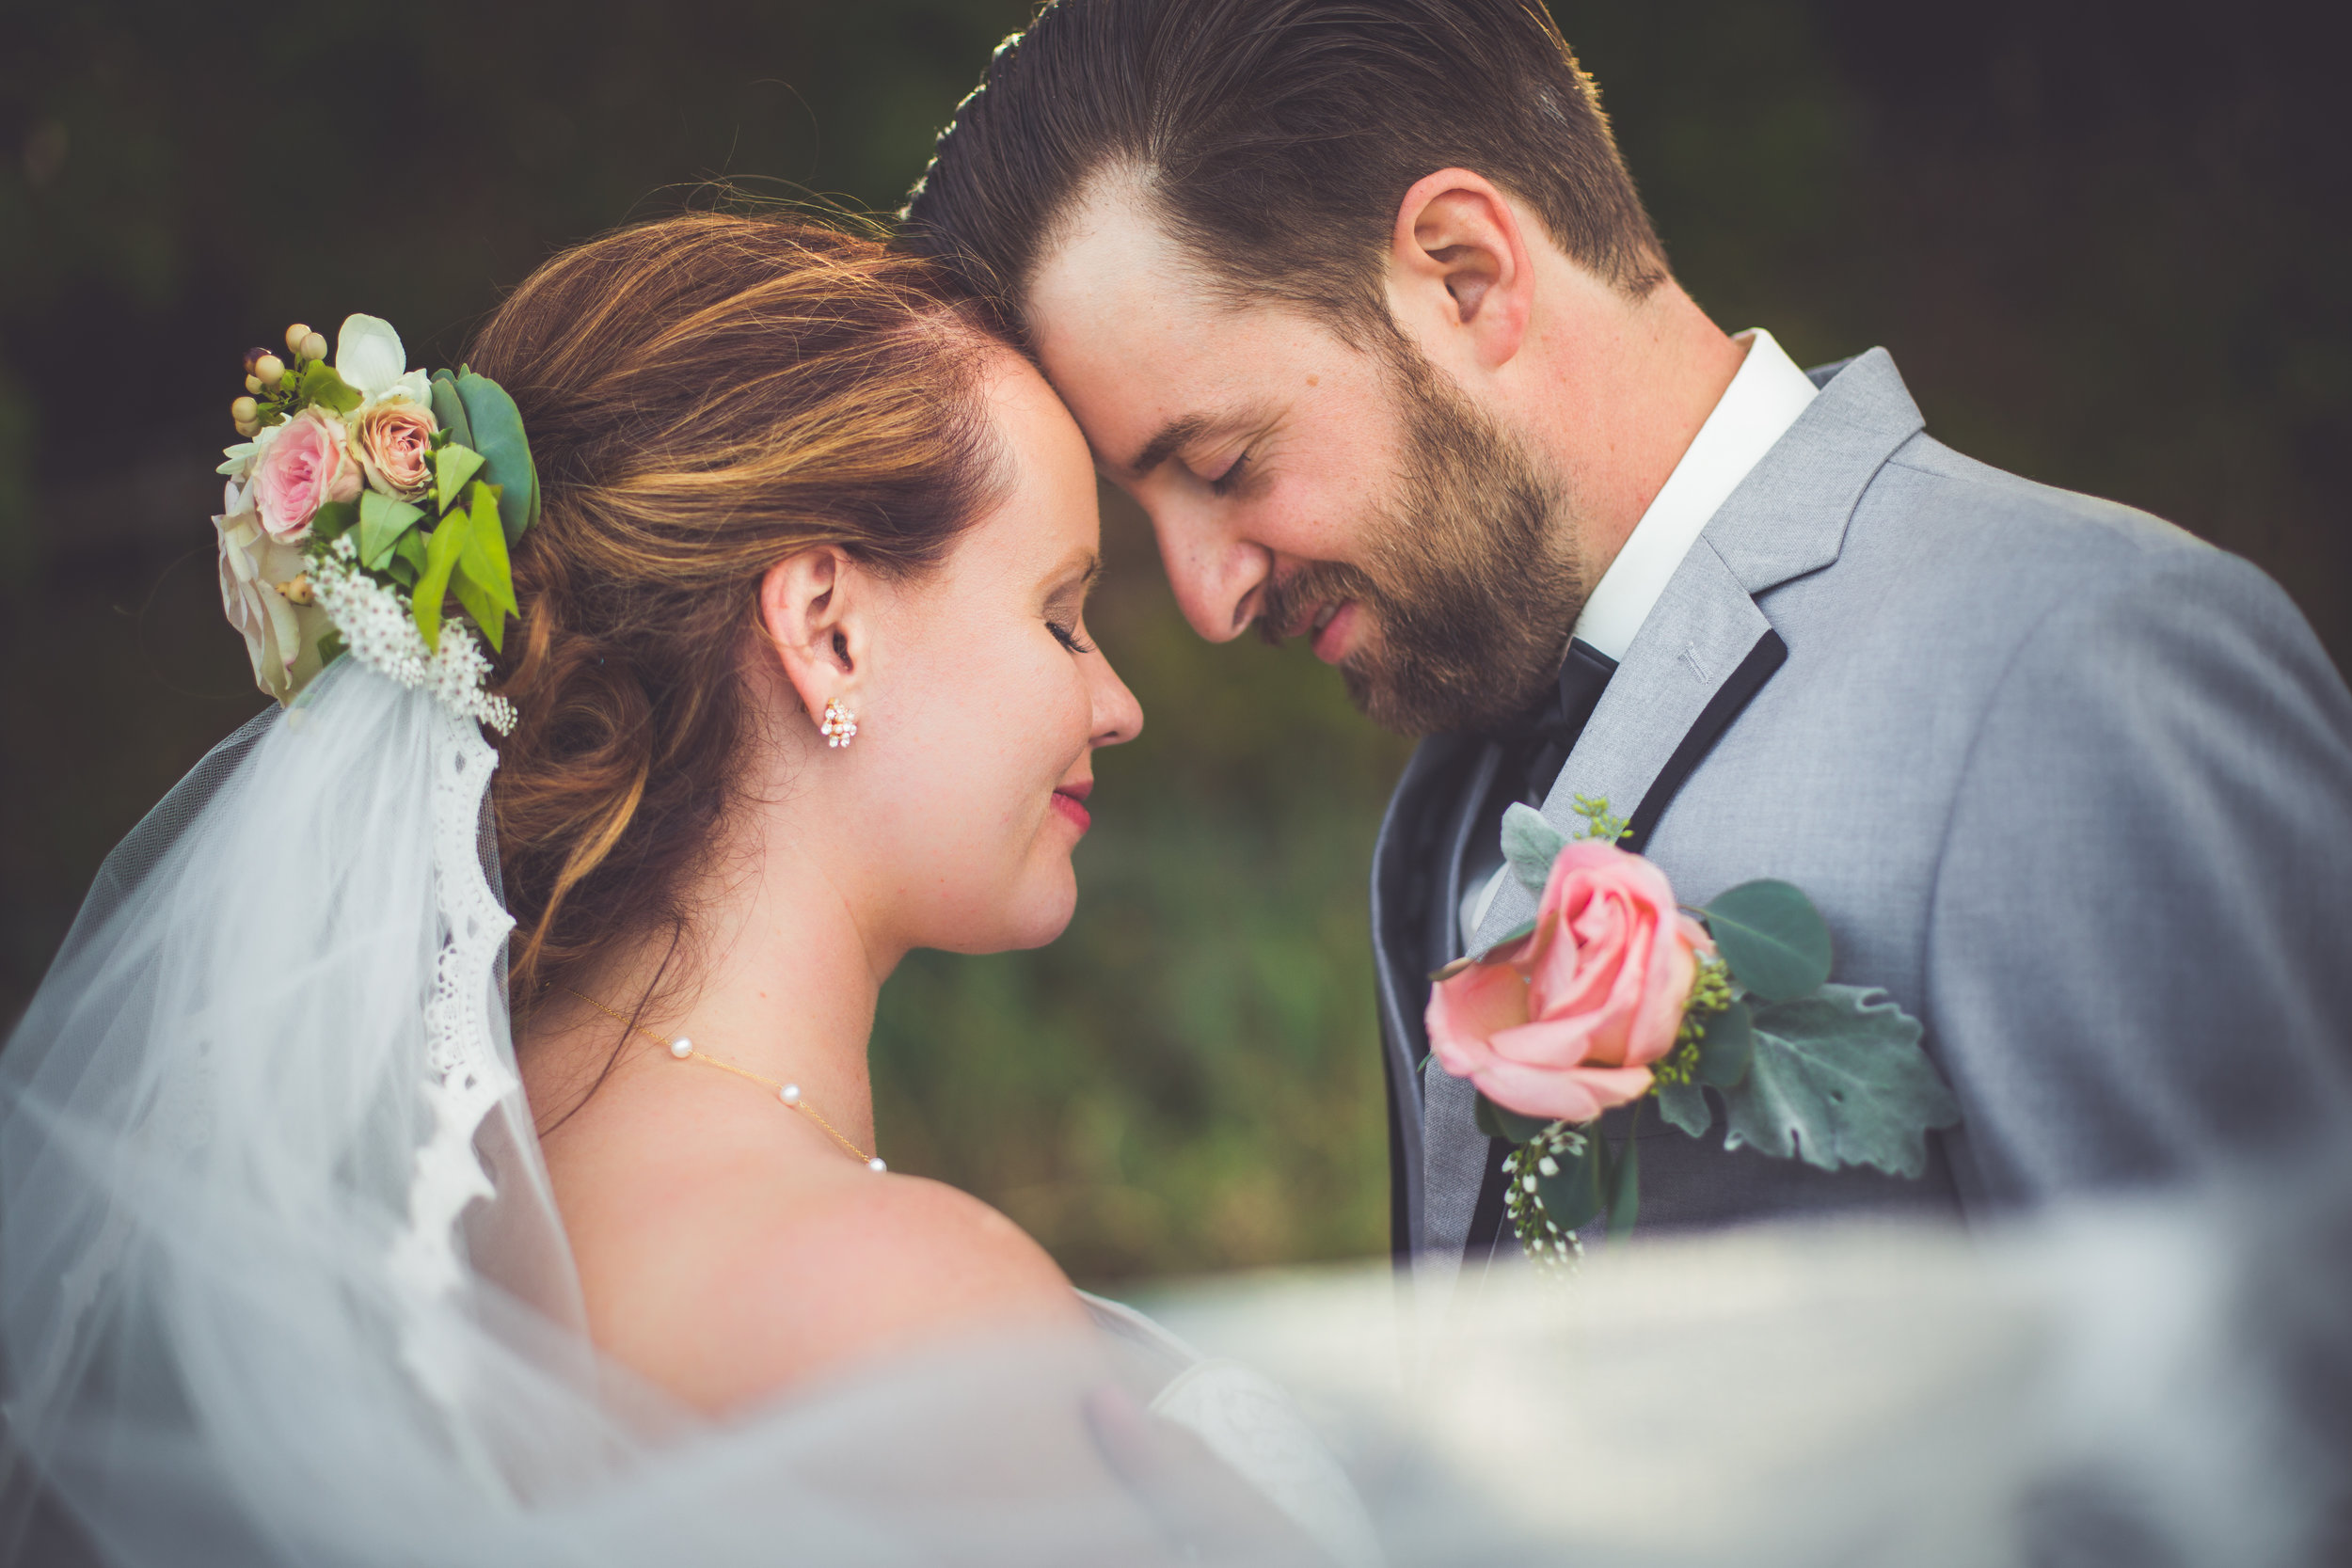 - WEDDING PLANNING SERVICES